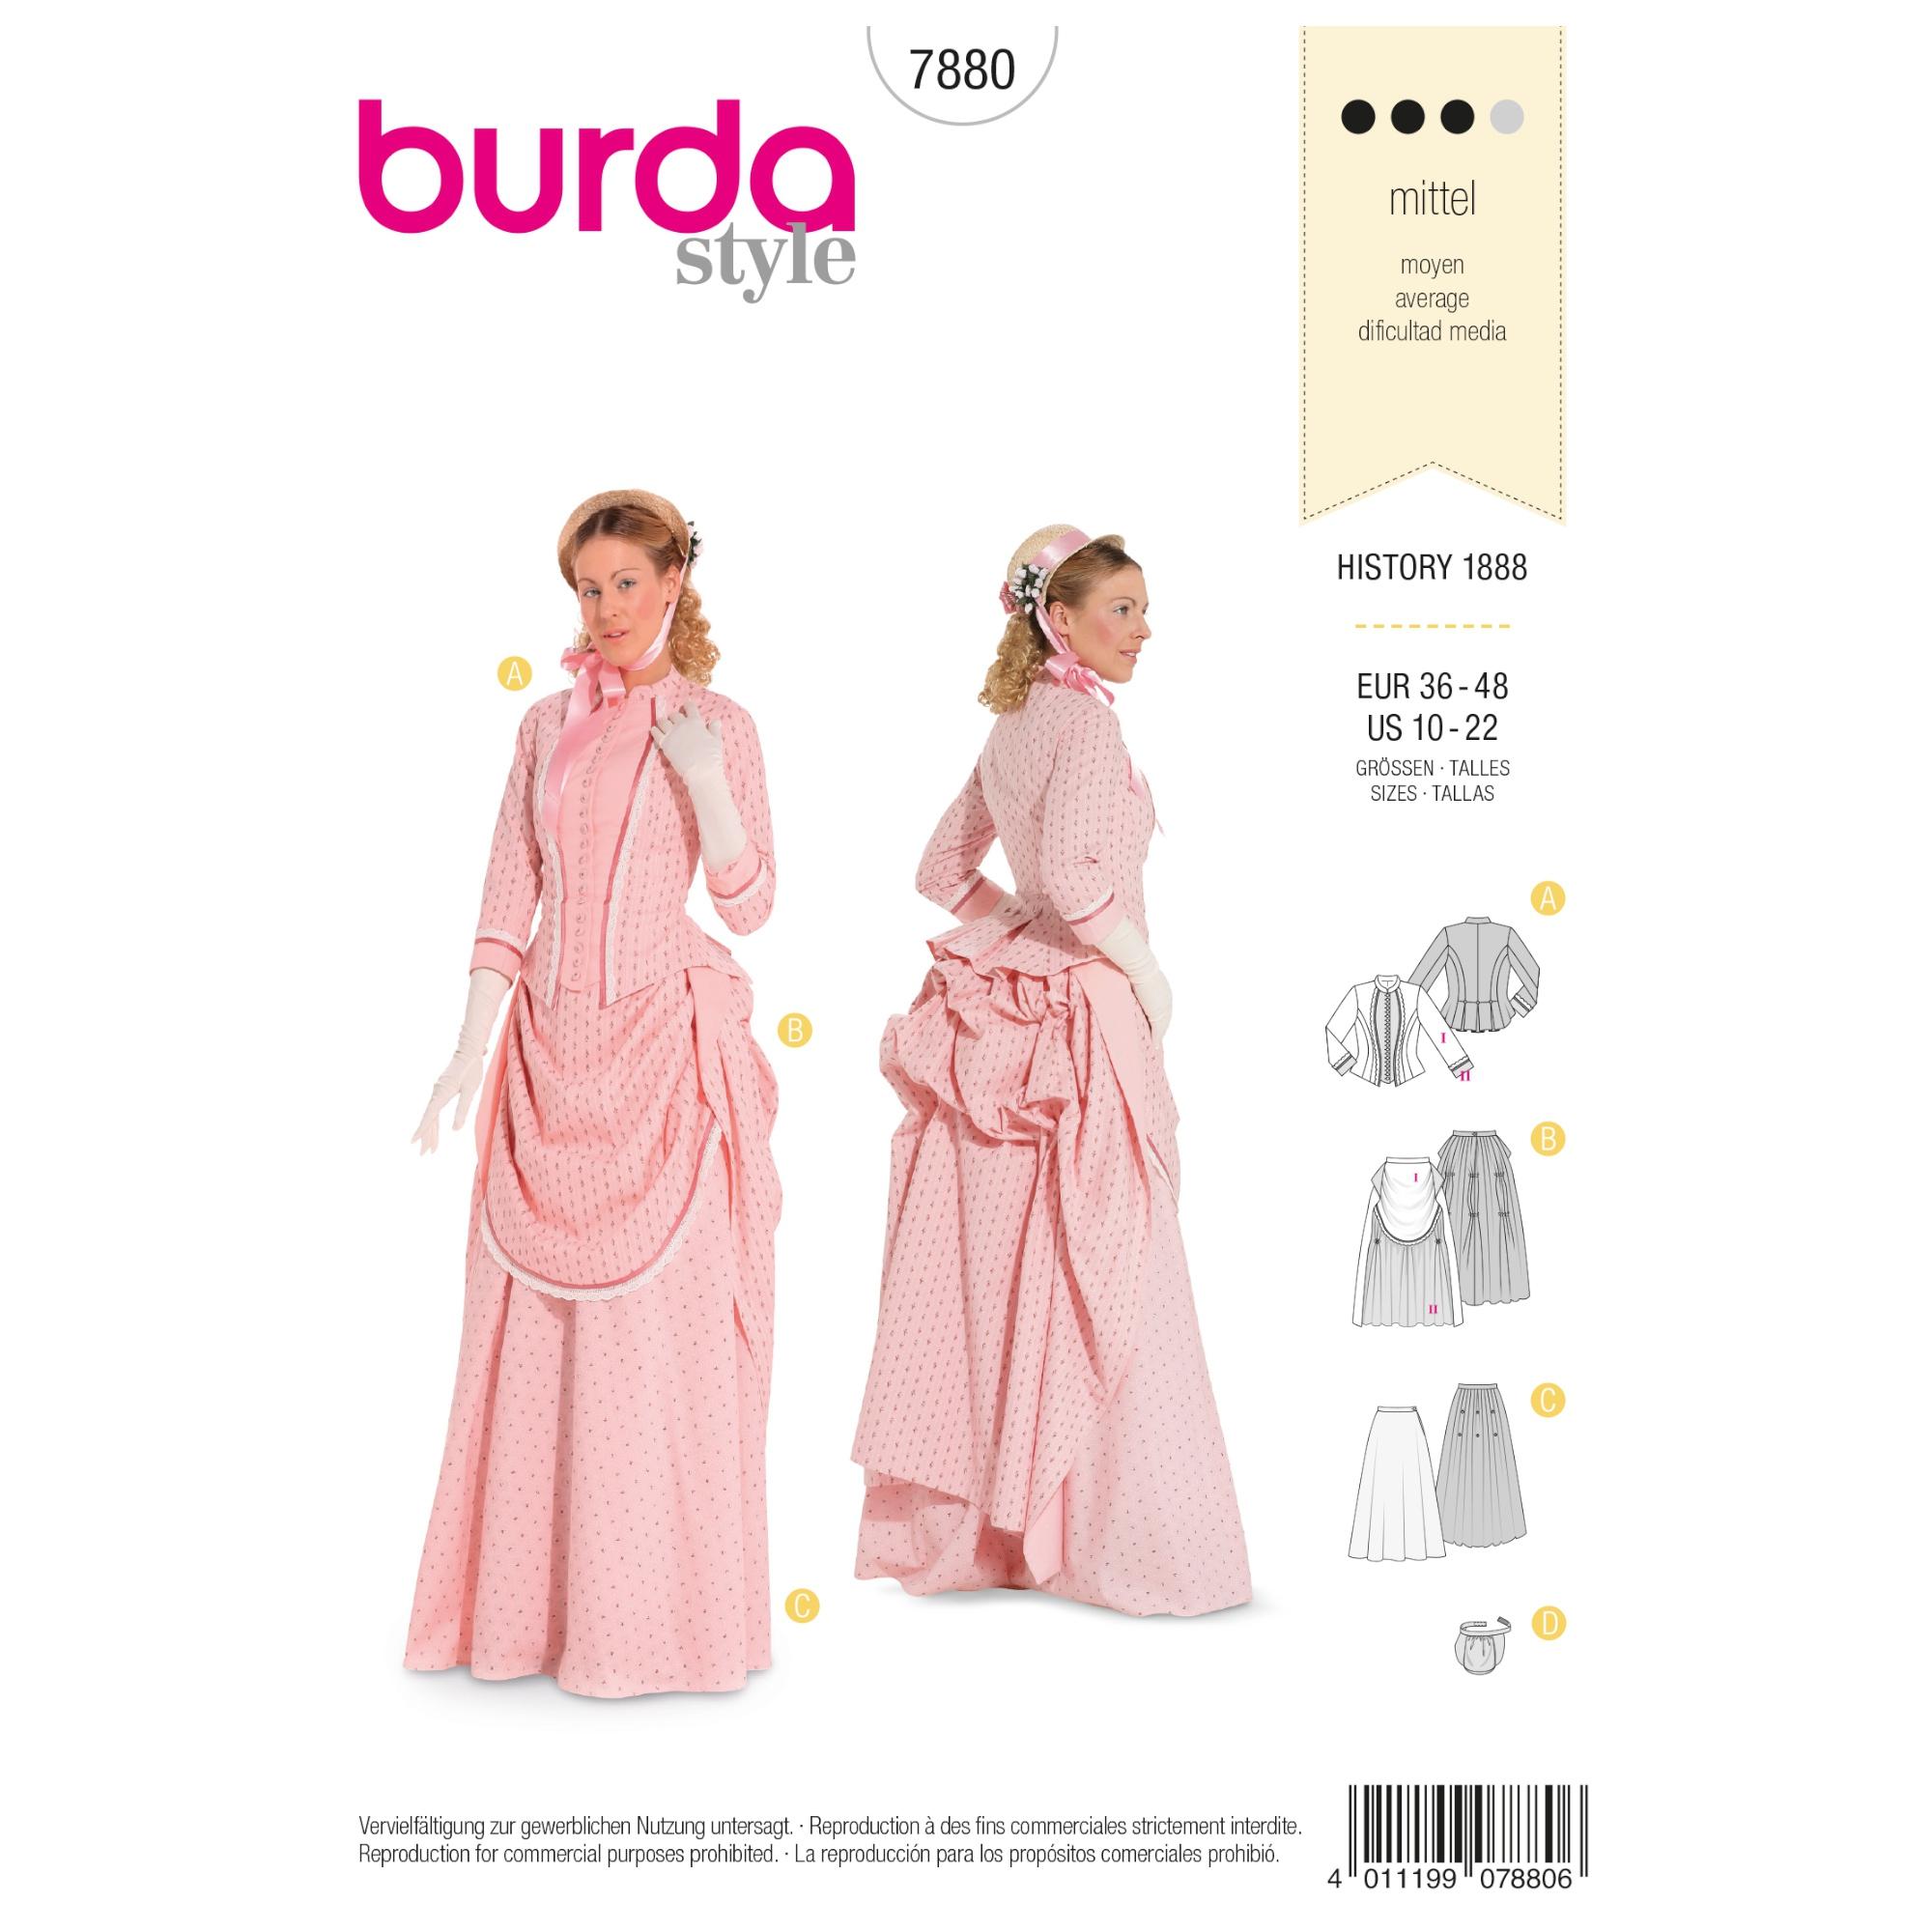 Schnittmuster Historisches Kleid, Burda 7880 | stoffe-hemmers.de